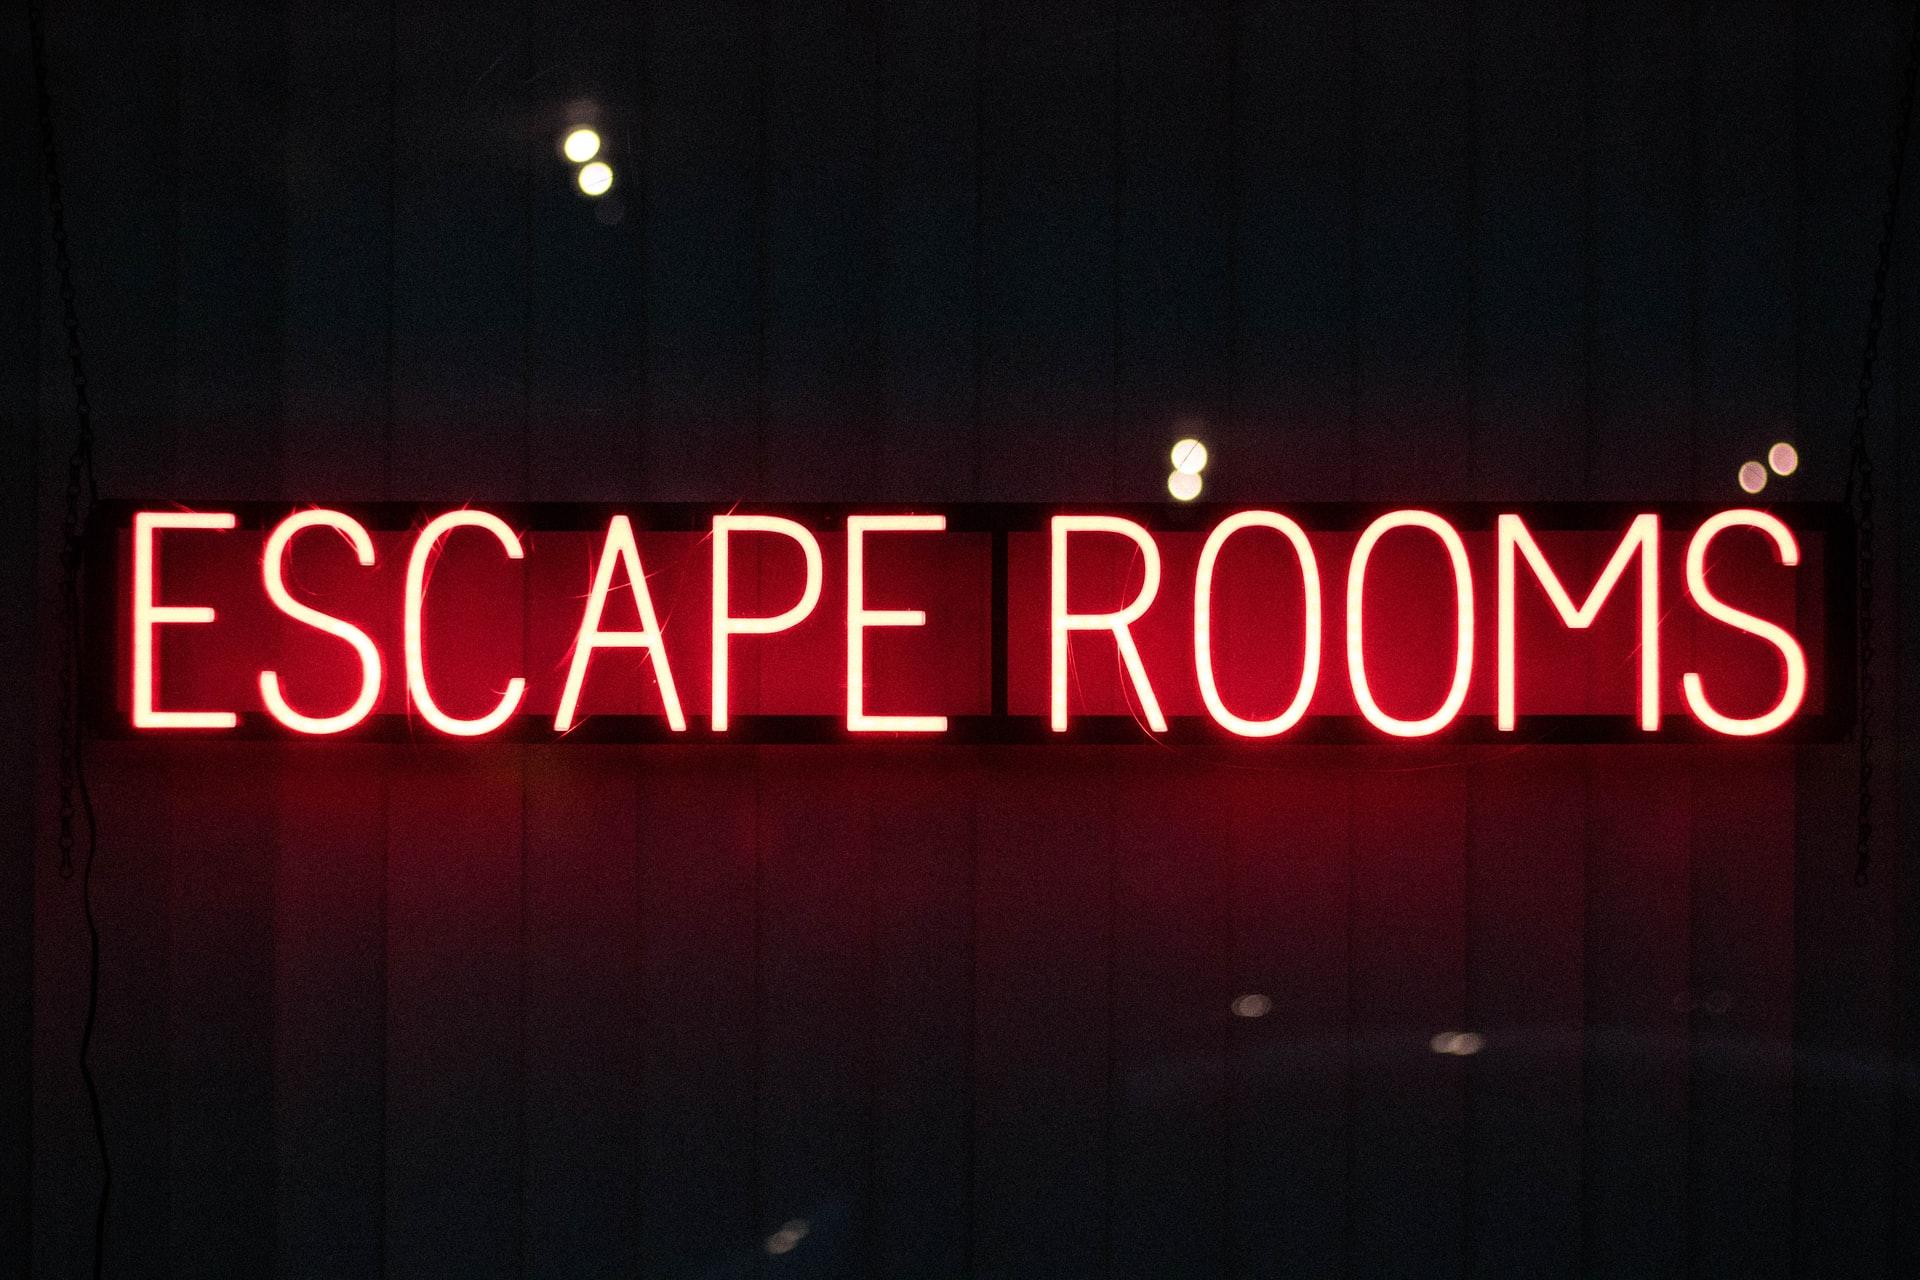 neon-red-escape-rooms-sign-in-dark-room